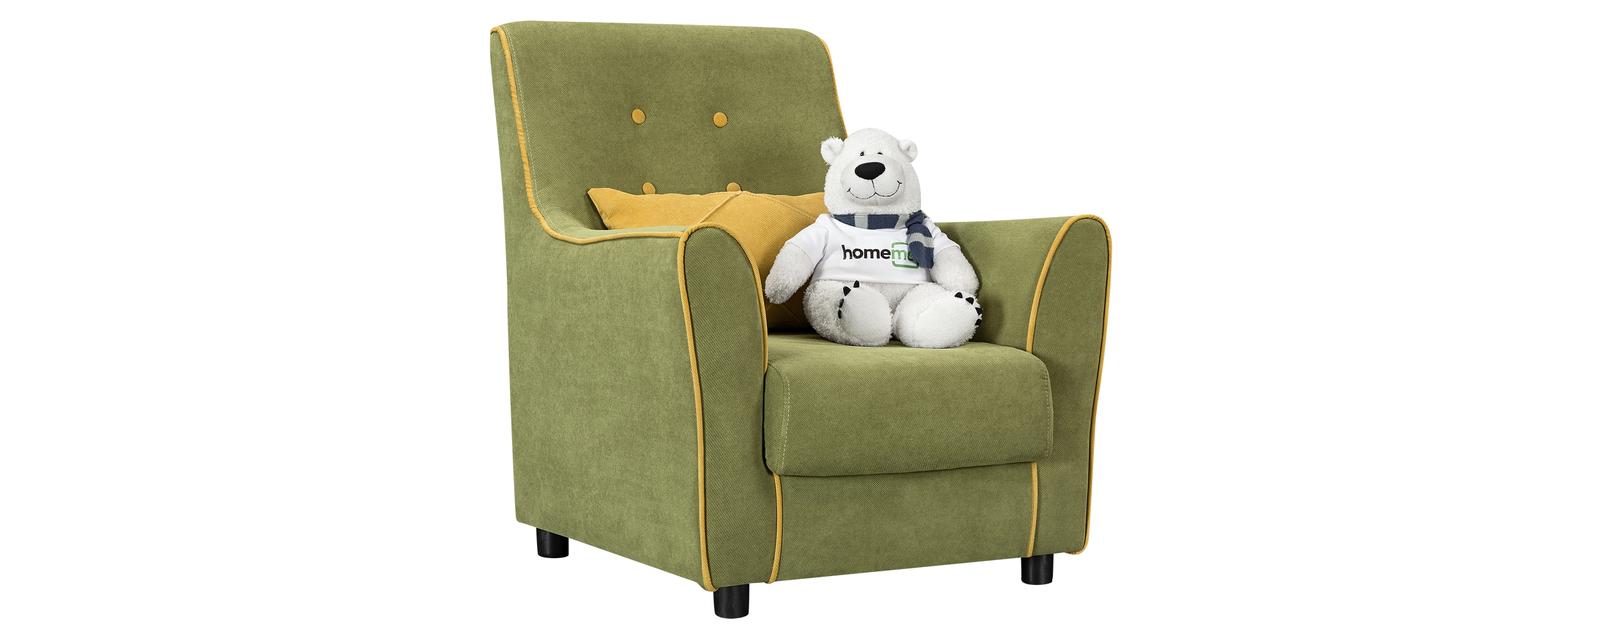 Кресло тканевое Флэтфорд Marselle фисташковый/желтый (Микровелюр) Флэтфорд